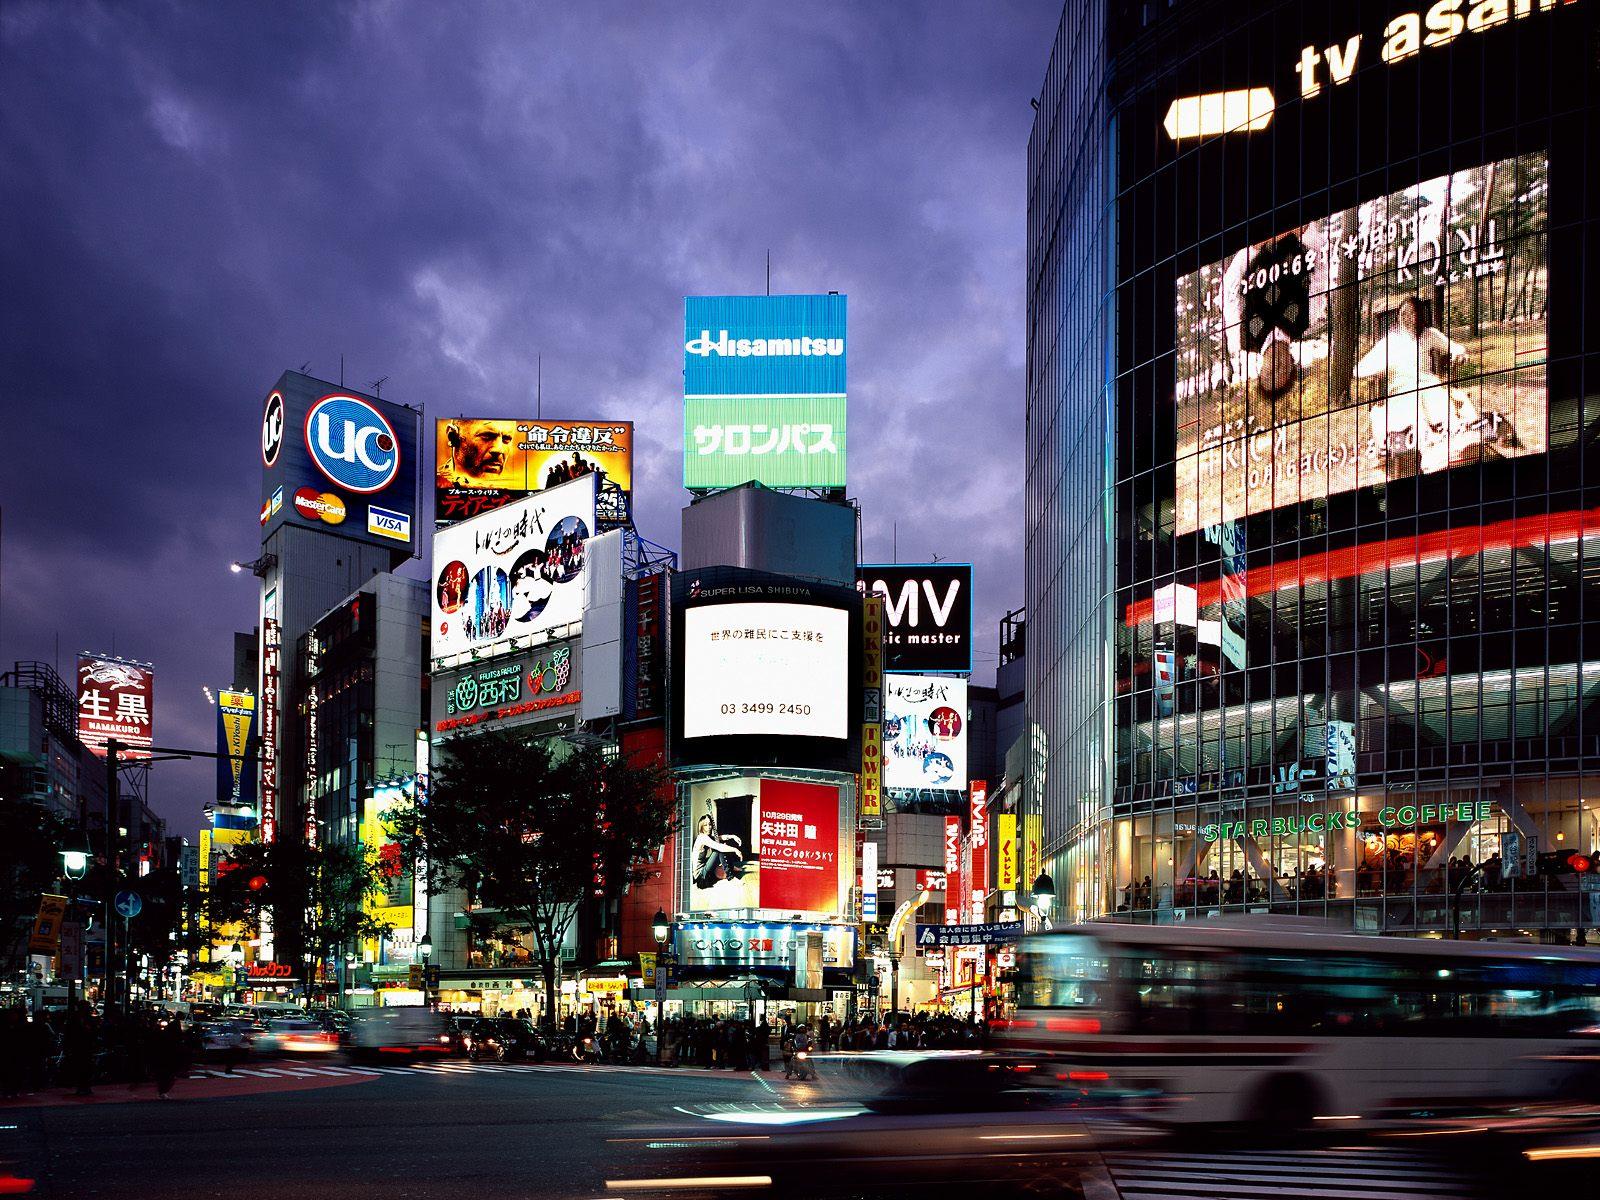 http://4.bp.blogspot.com/-4Ox7arWRtjw/TWaQf5yObvI/AAAAAAAAA-Y/Djszn23PMNg/s1600/tokyo_wallpaper_24220111.jpg